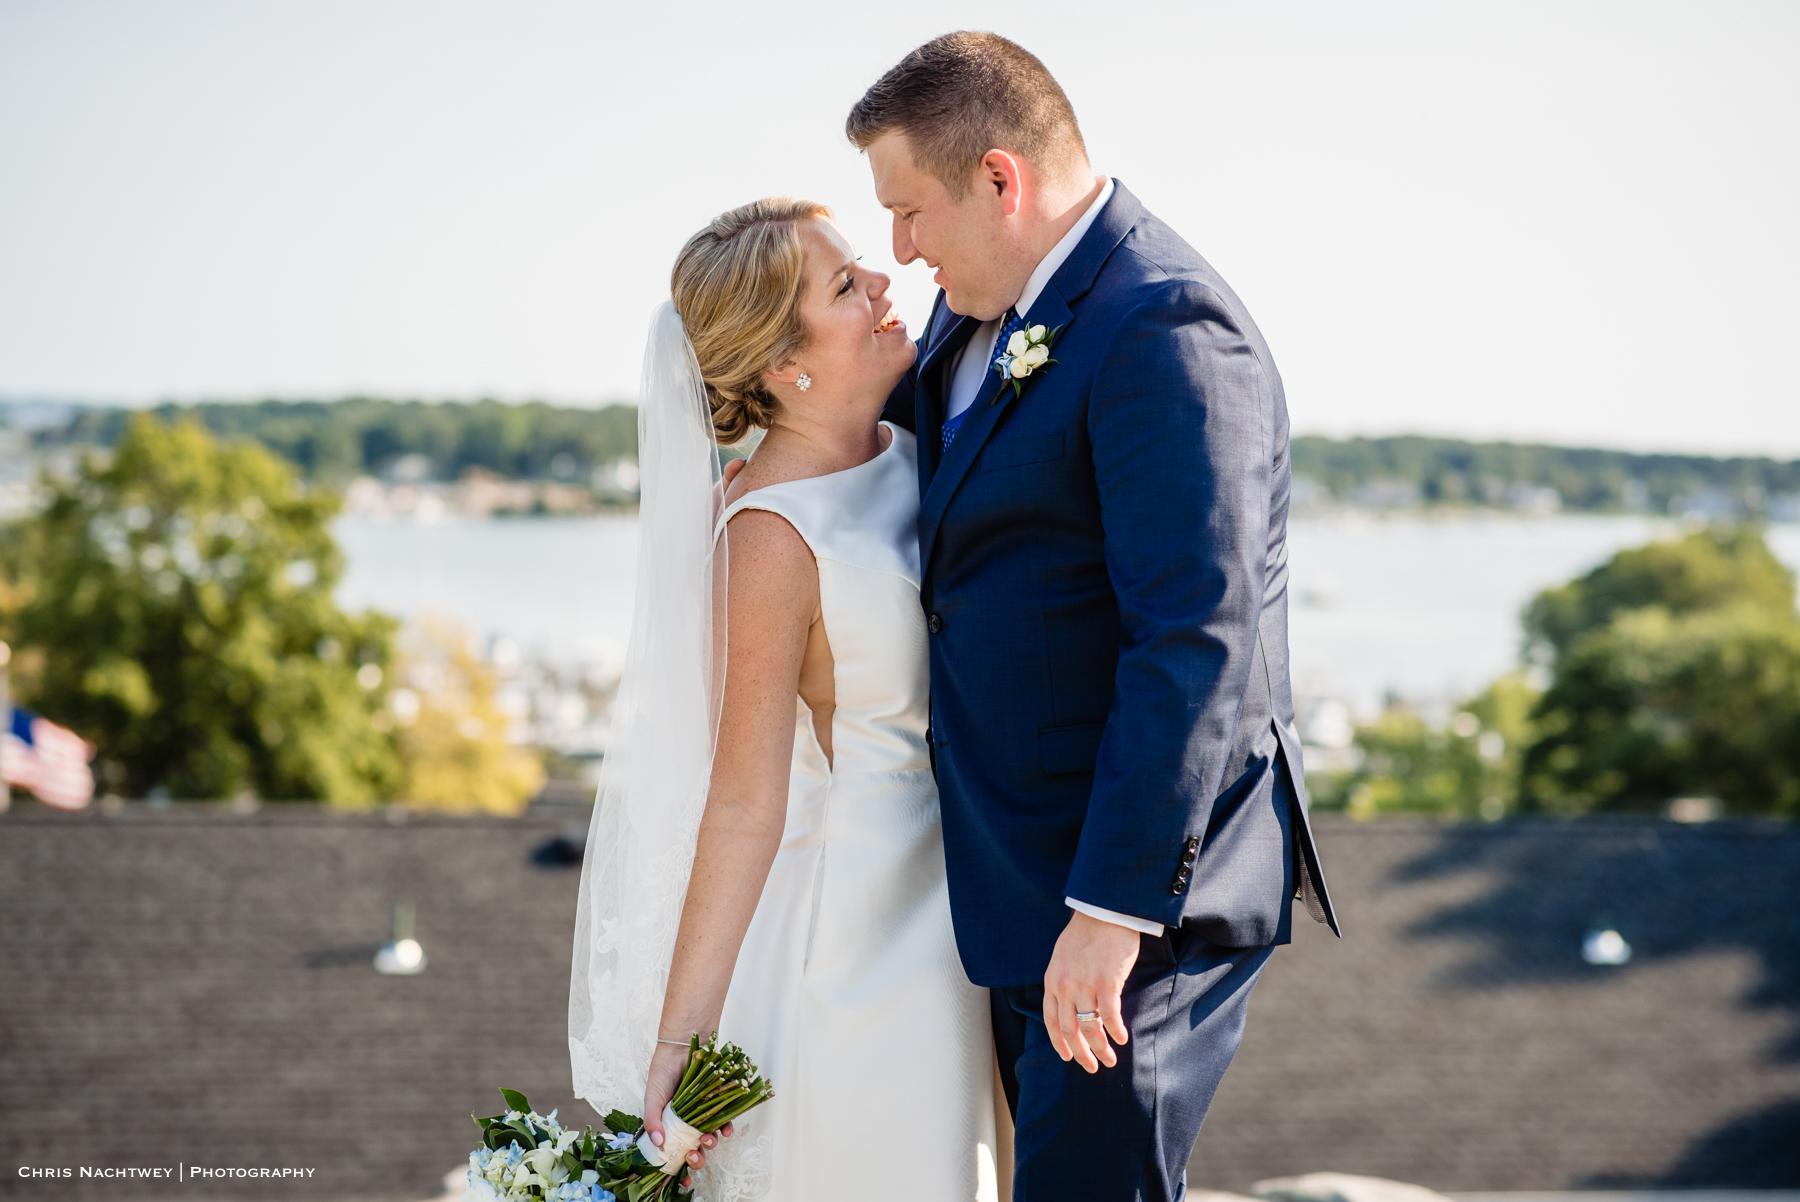 photos-wedding-haley-mansion-mystic-ct-chris-nachtwey-photography-2019-25.jpg